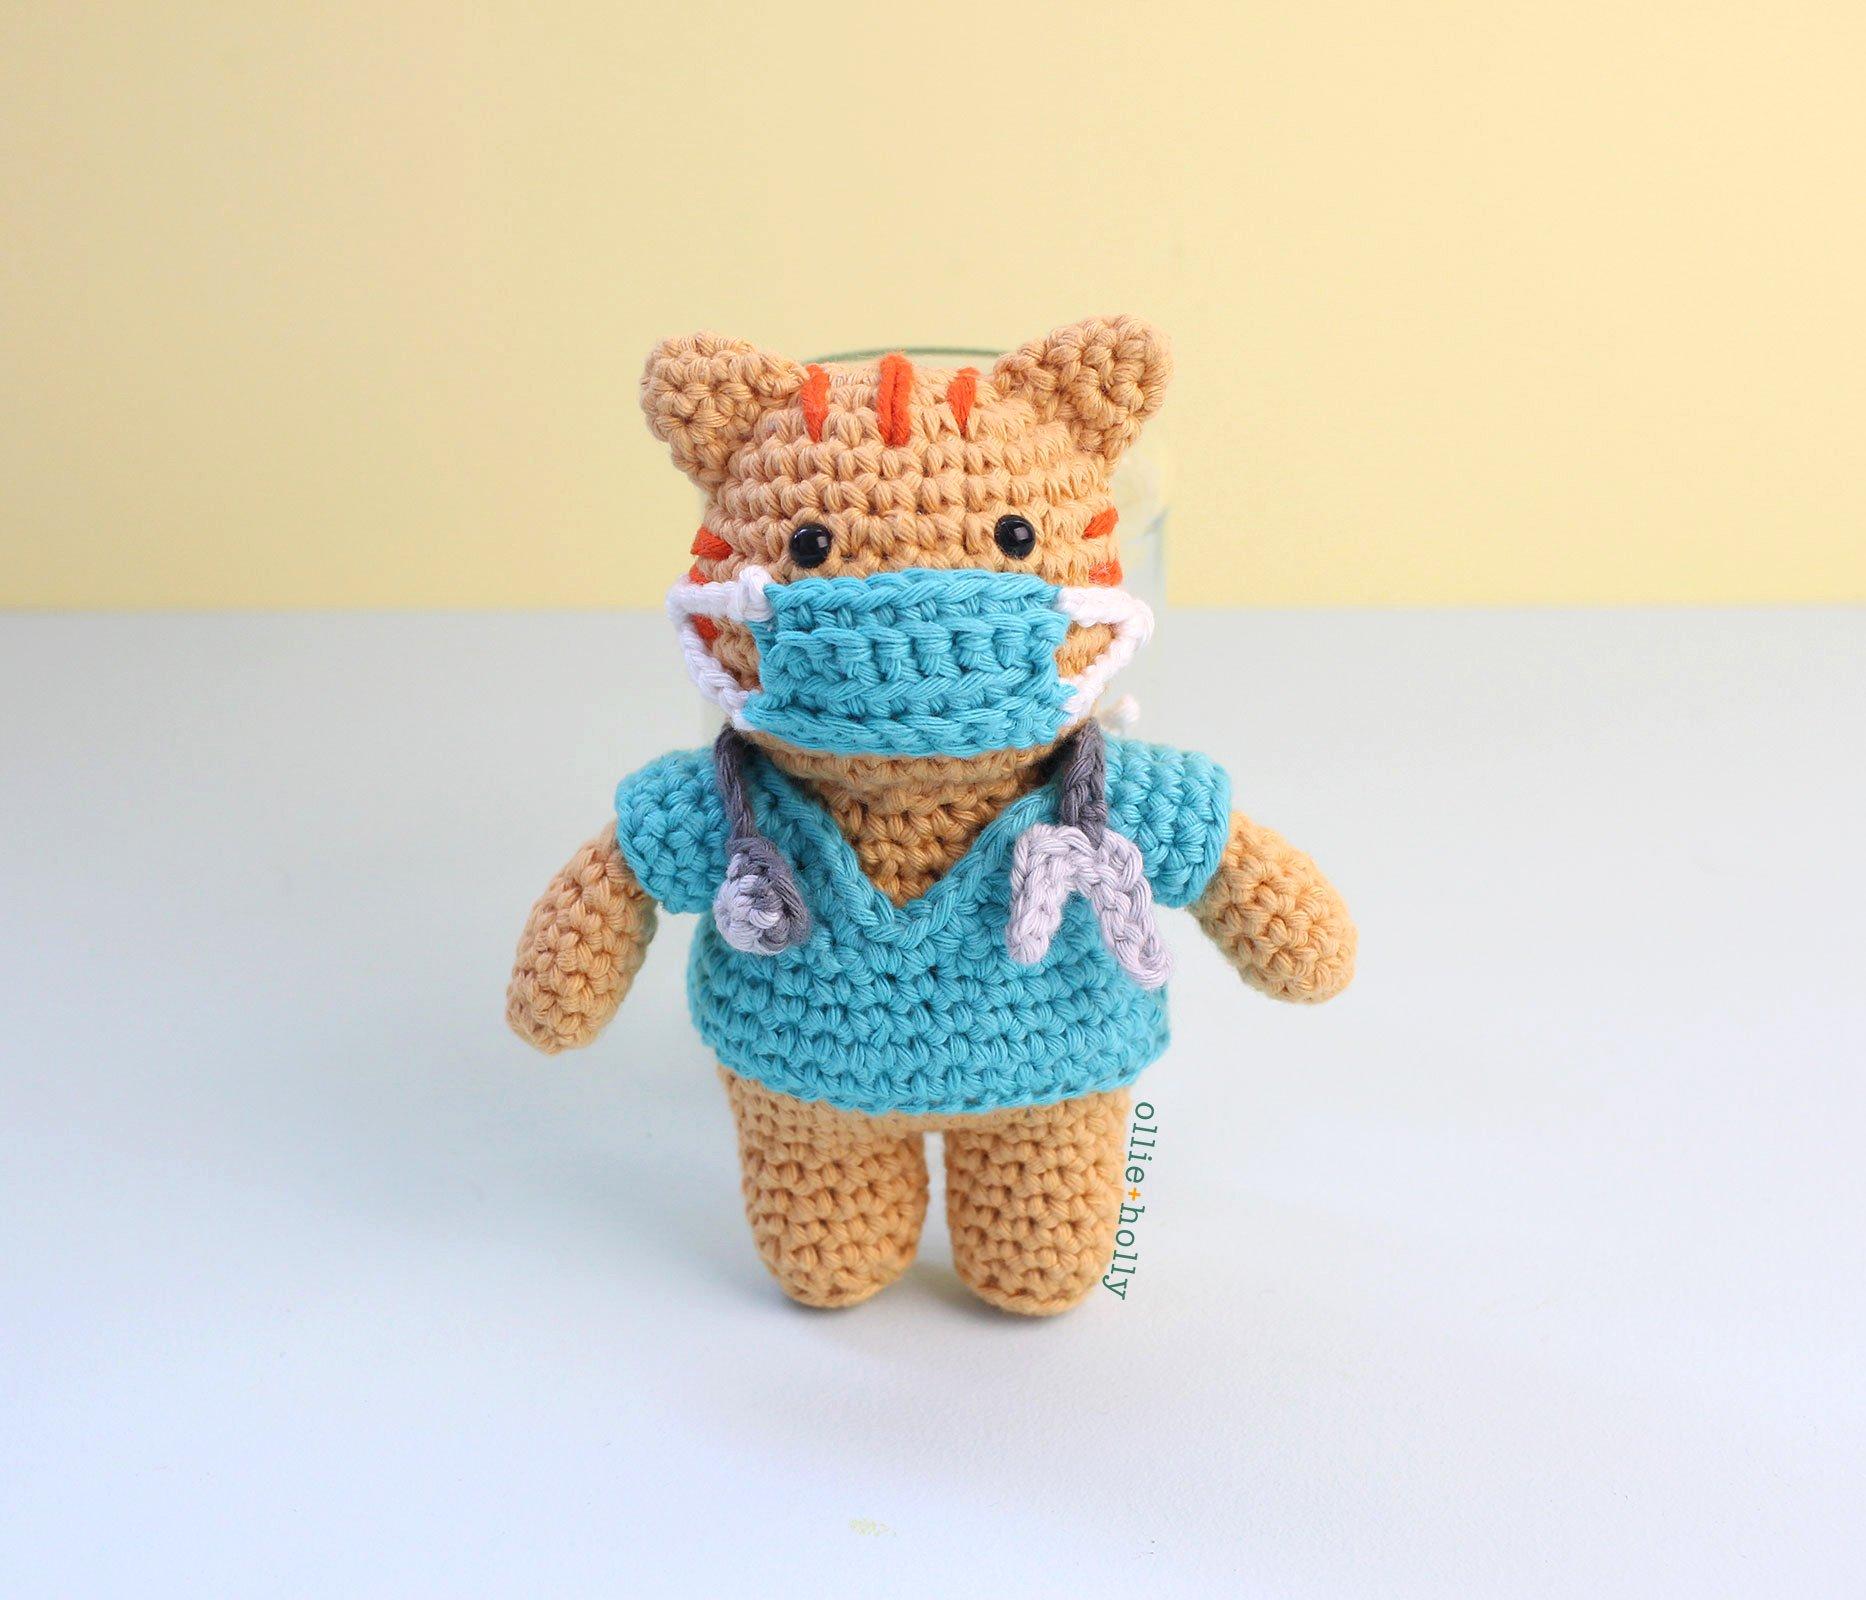 Amigurumi panda free pattern | crochet toy pattern lilleliis | 1600x1866